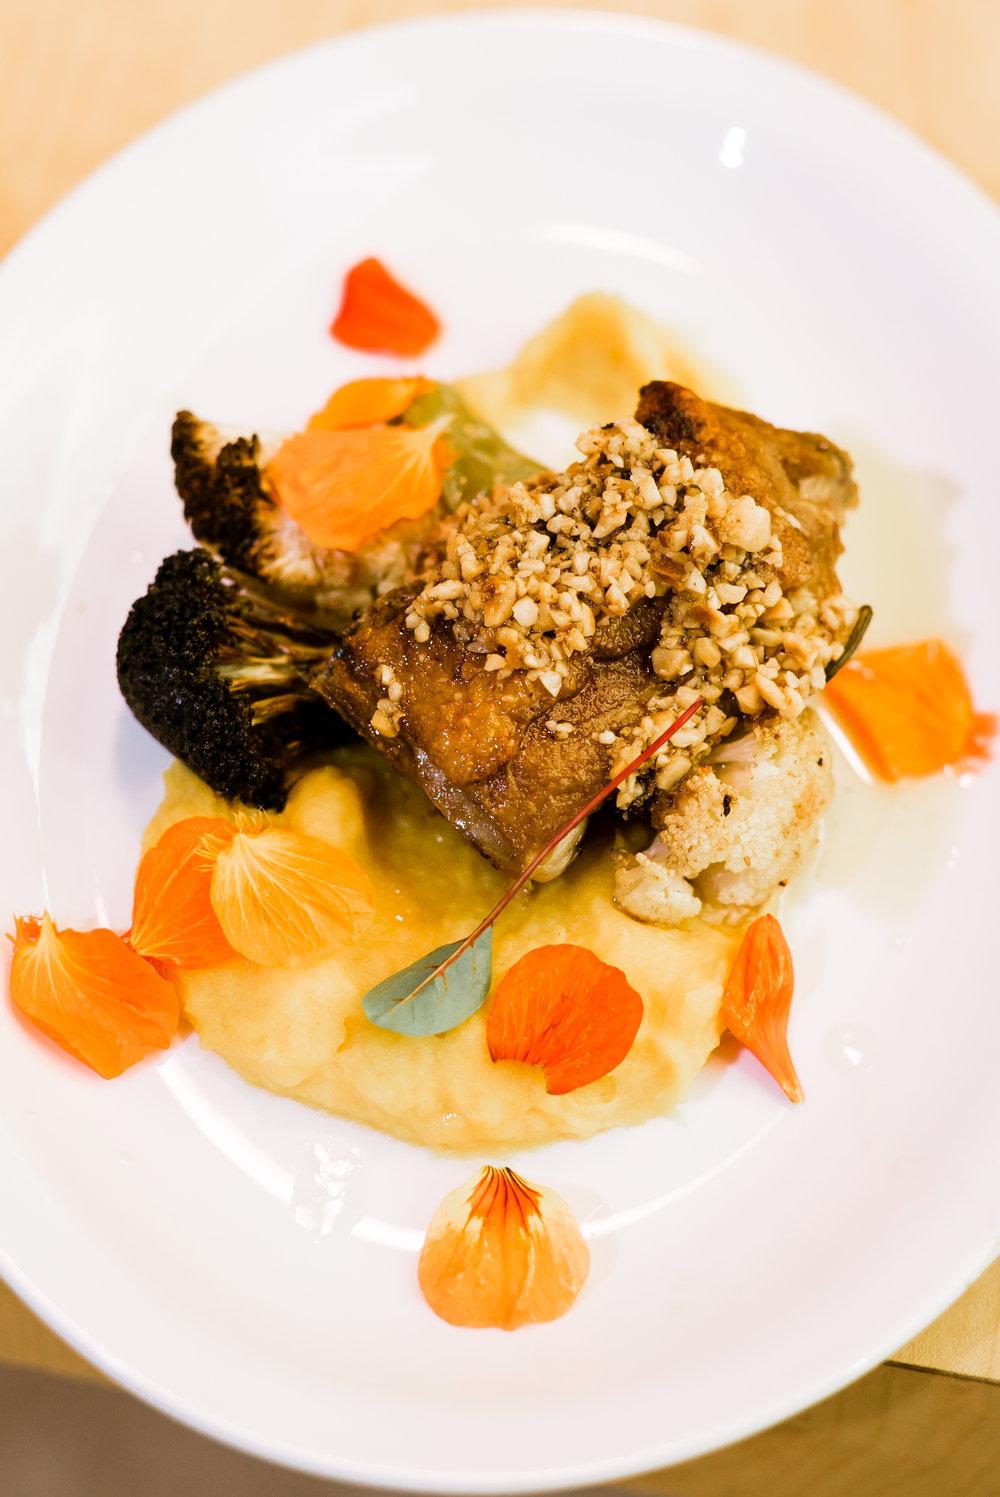 Oven Roasted Chicken  thigh butternut squash-potato mash, hard roasted cauliflower and broccoli, hazelnut brown butter sage